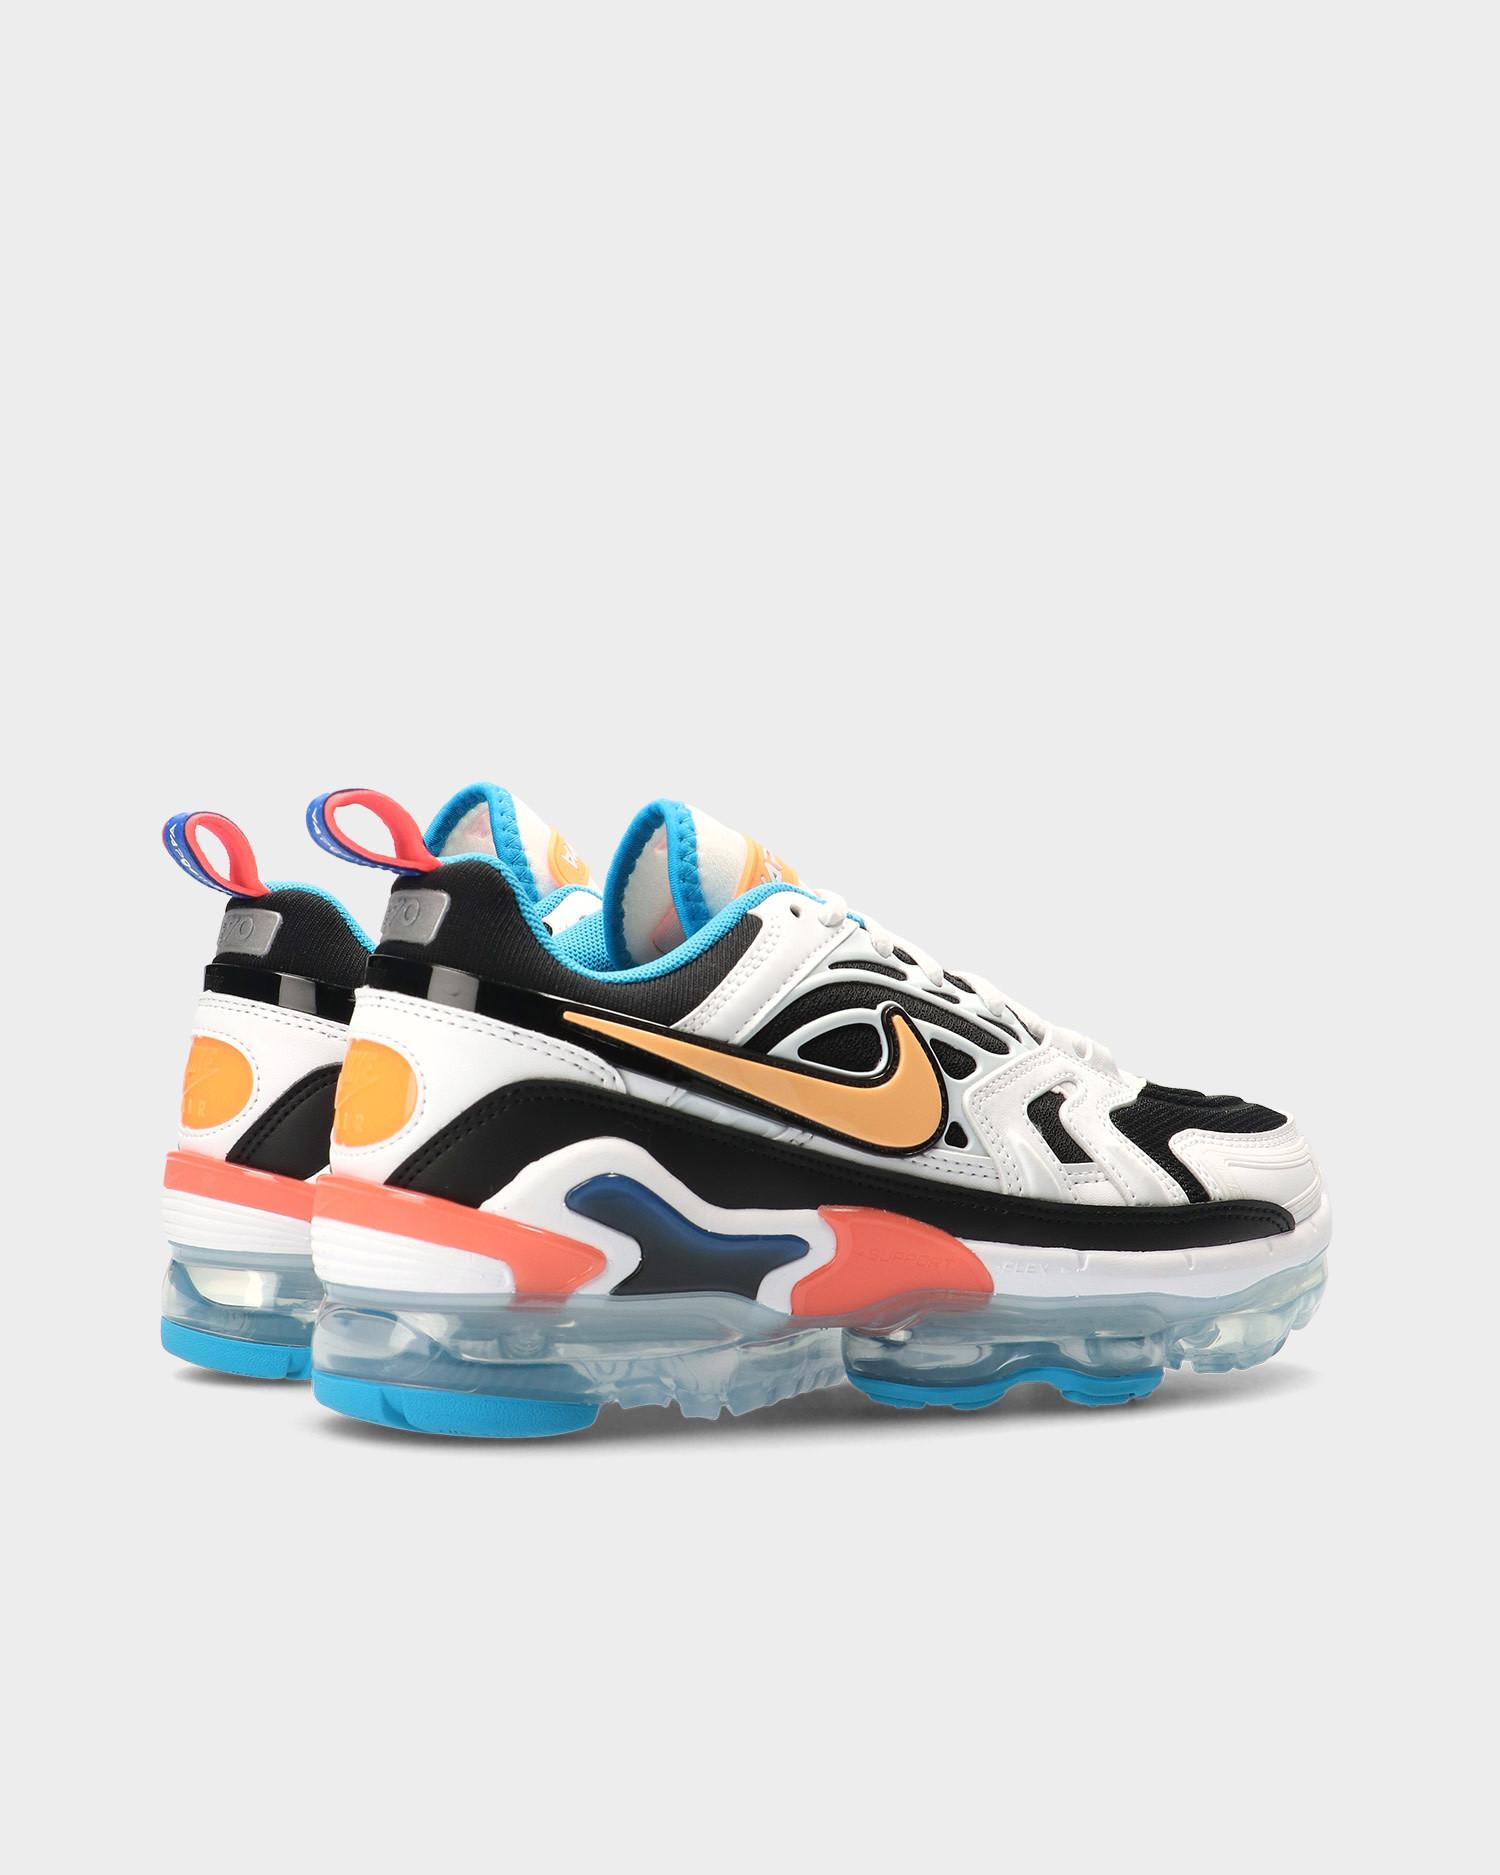 Nike W air vapormax evo Black/bright citrus-white-laser blue